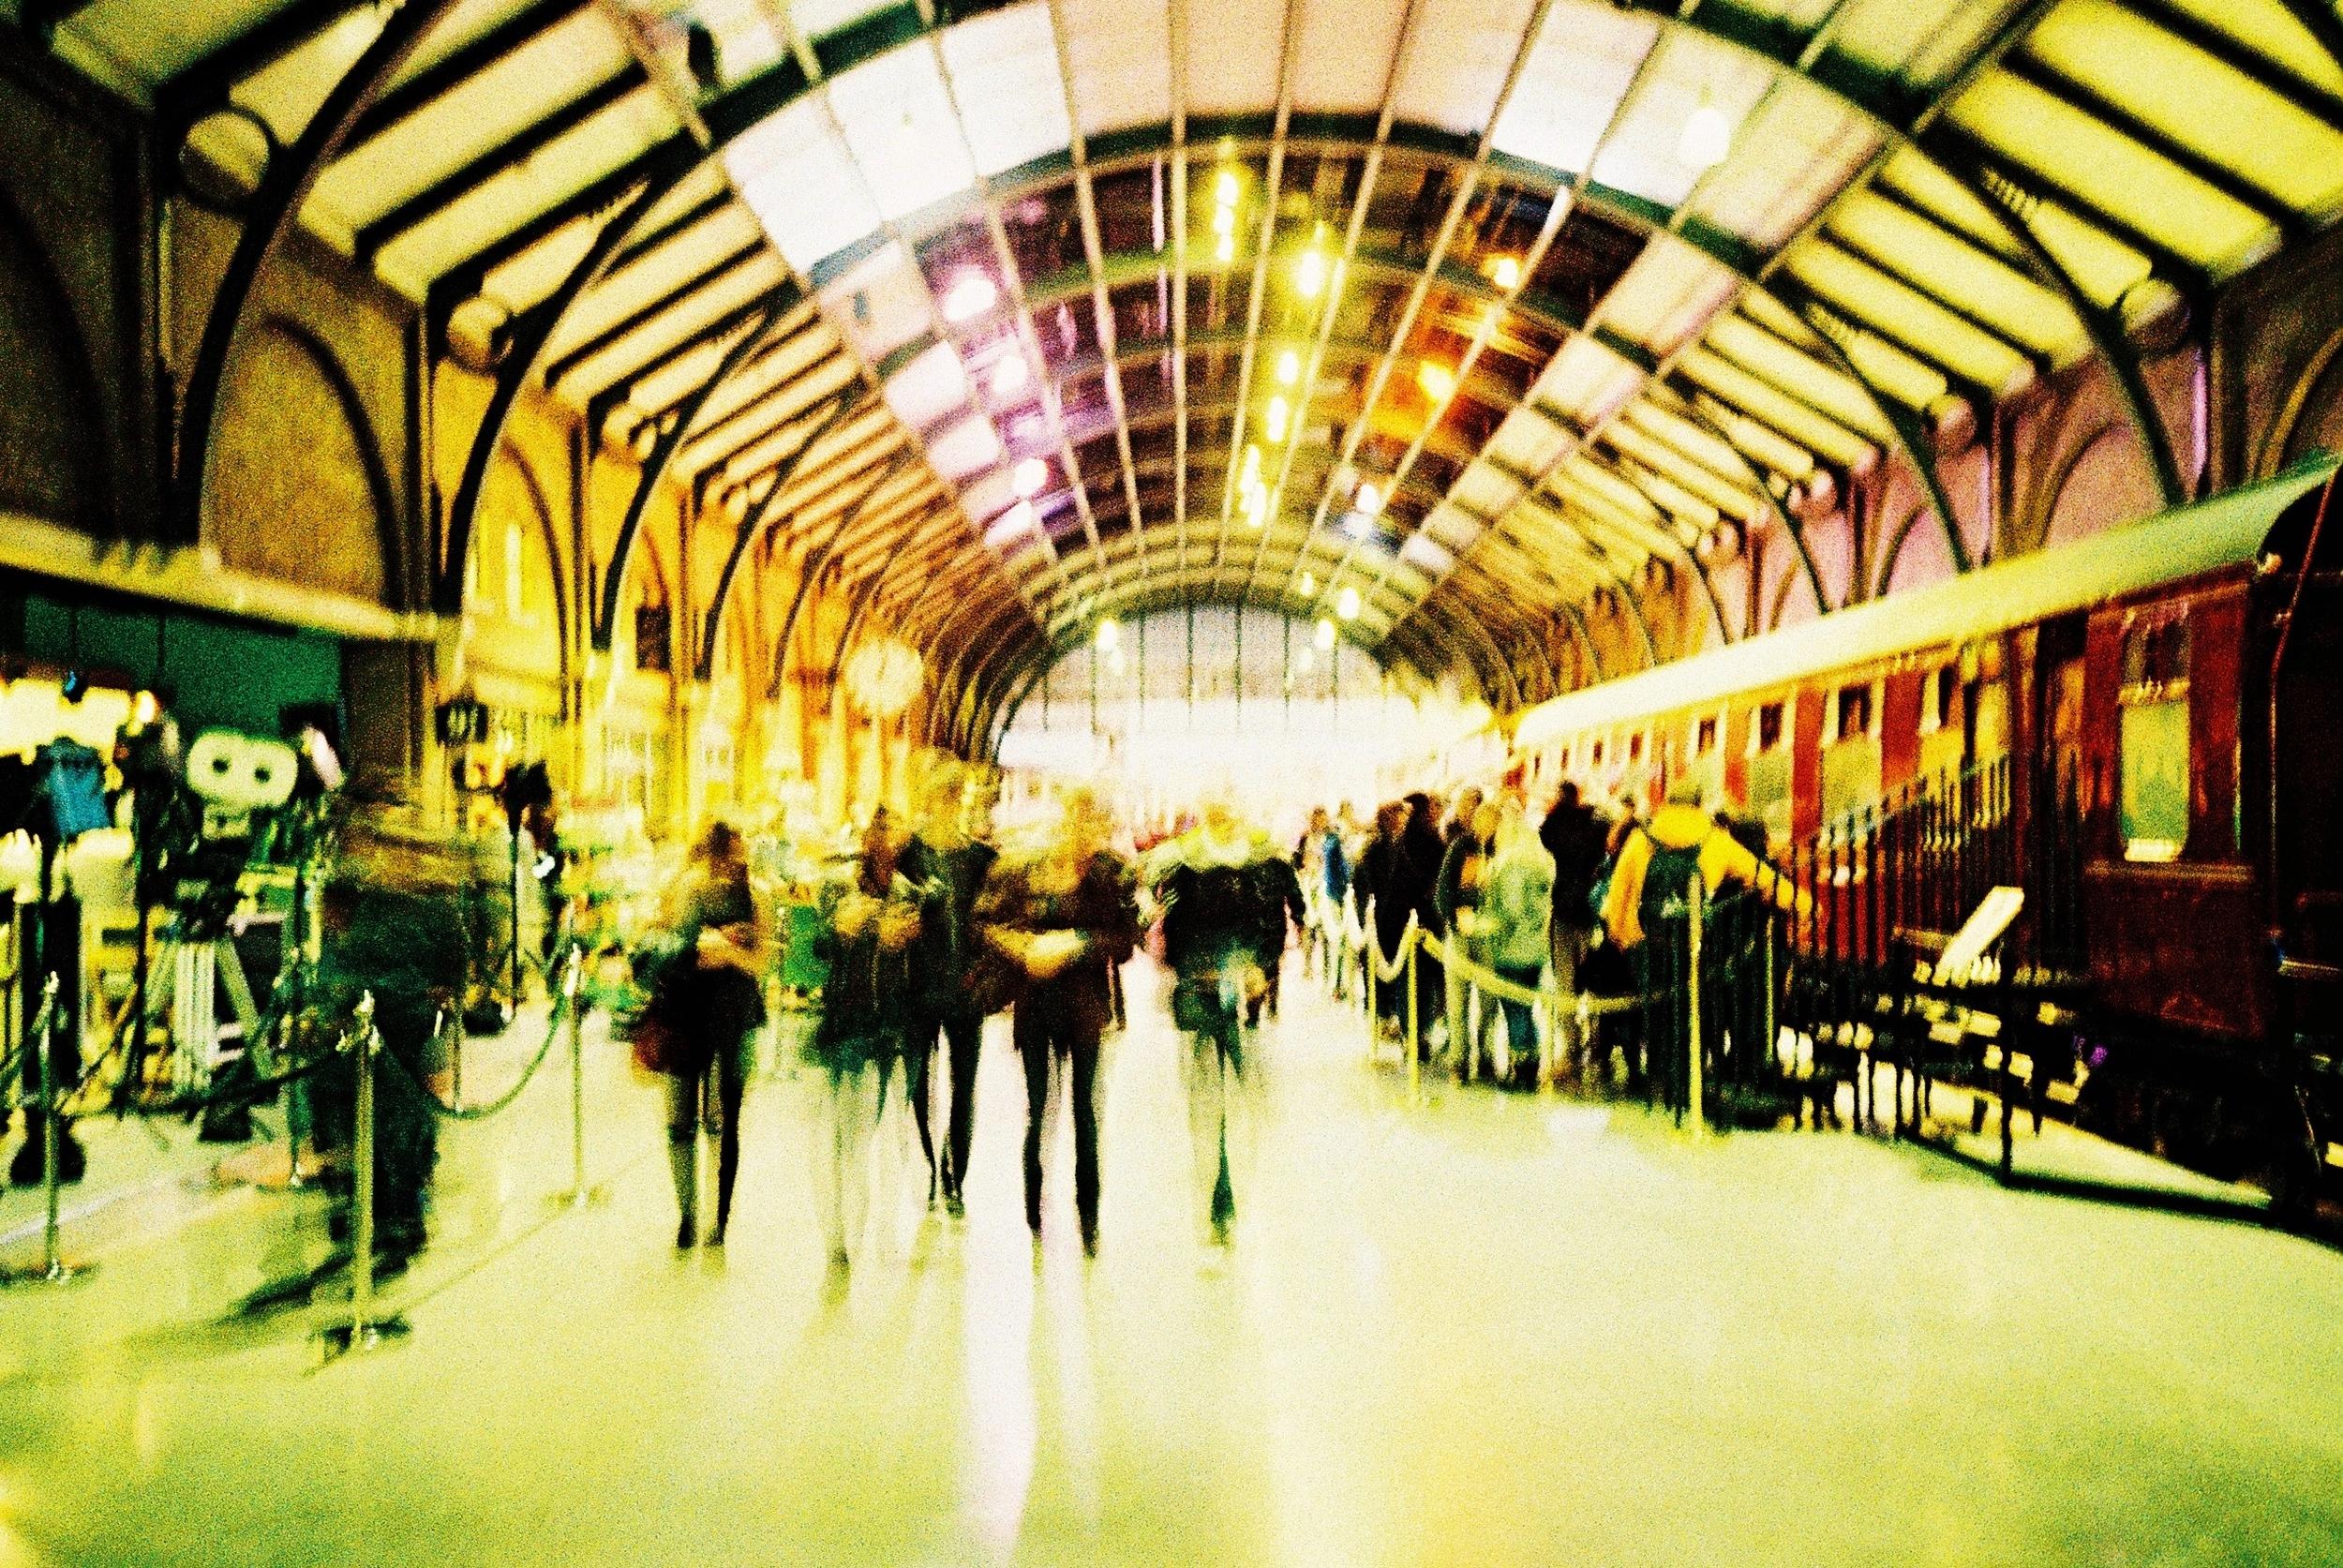 Lucy Wainwright |Untitled | Olympus XA4 | Sensia Xpro